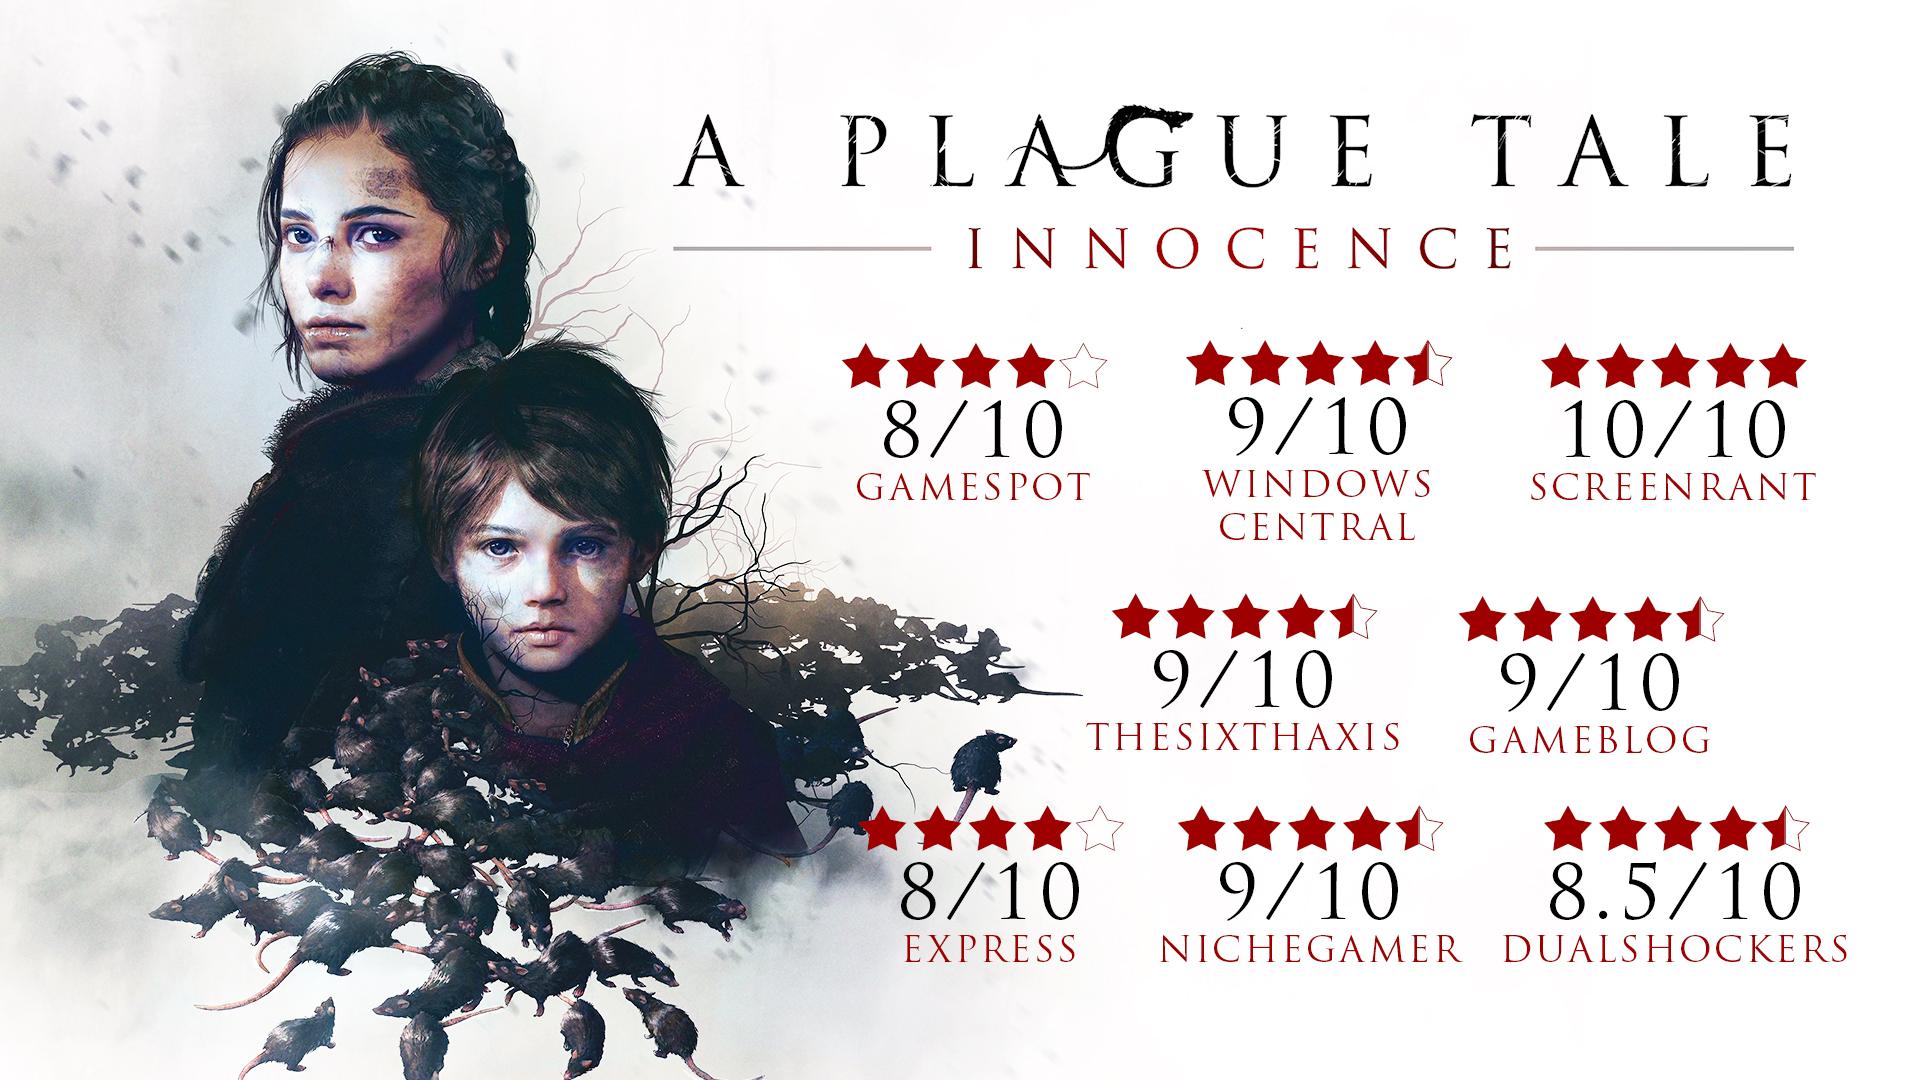 KHAiHOM.com - A Plague Tale: Innocence